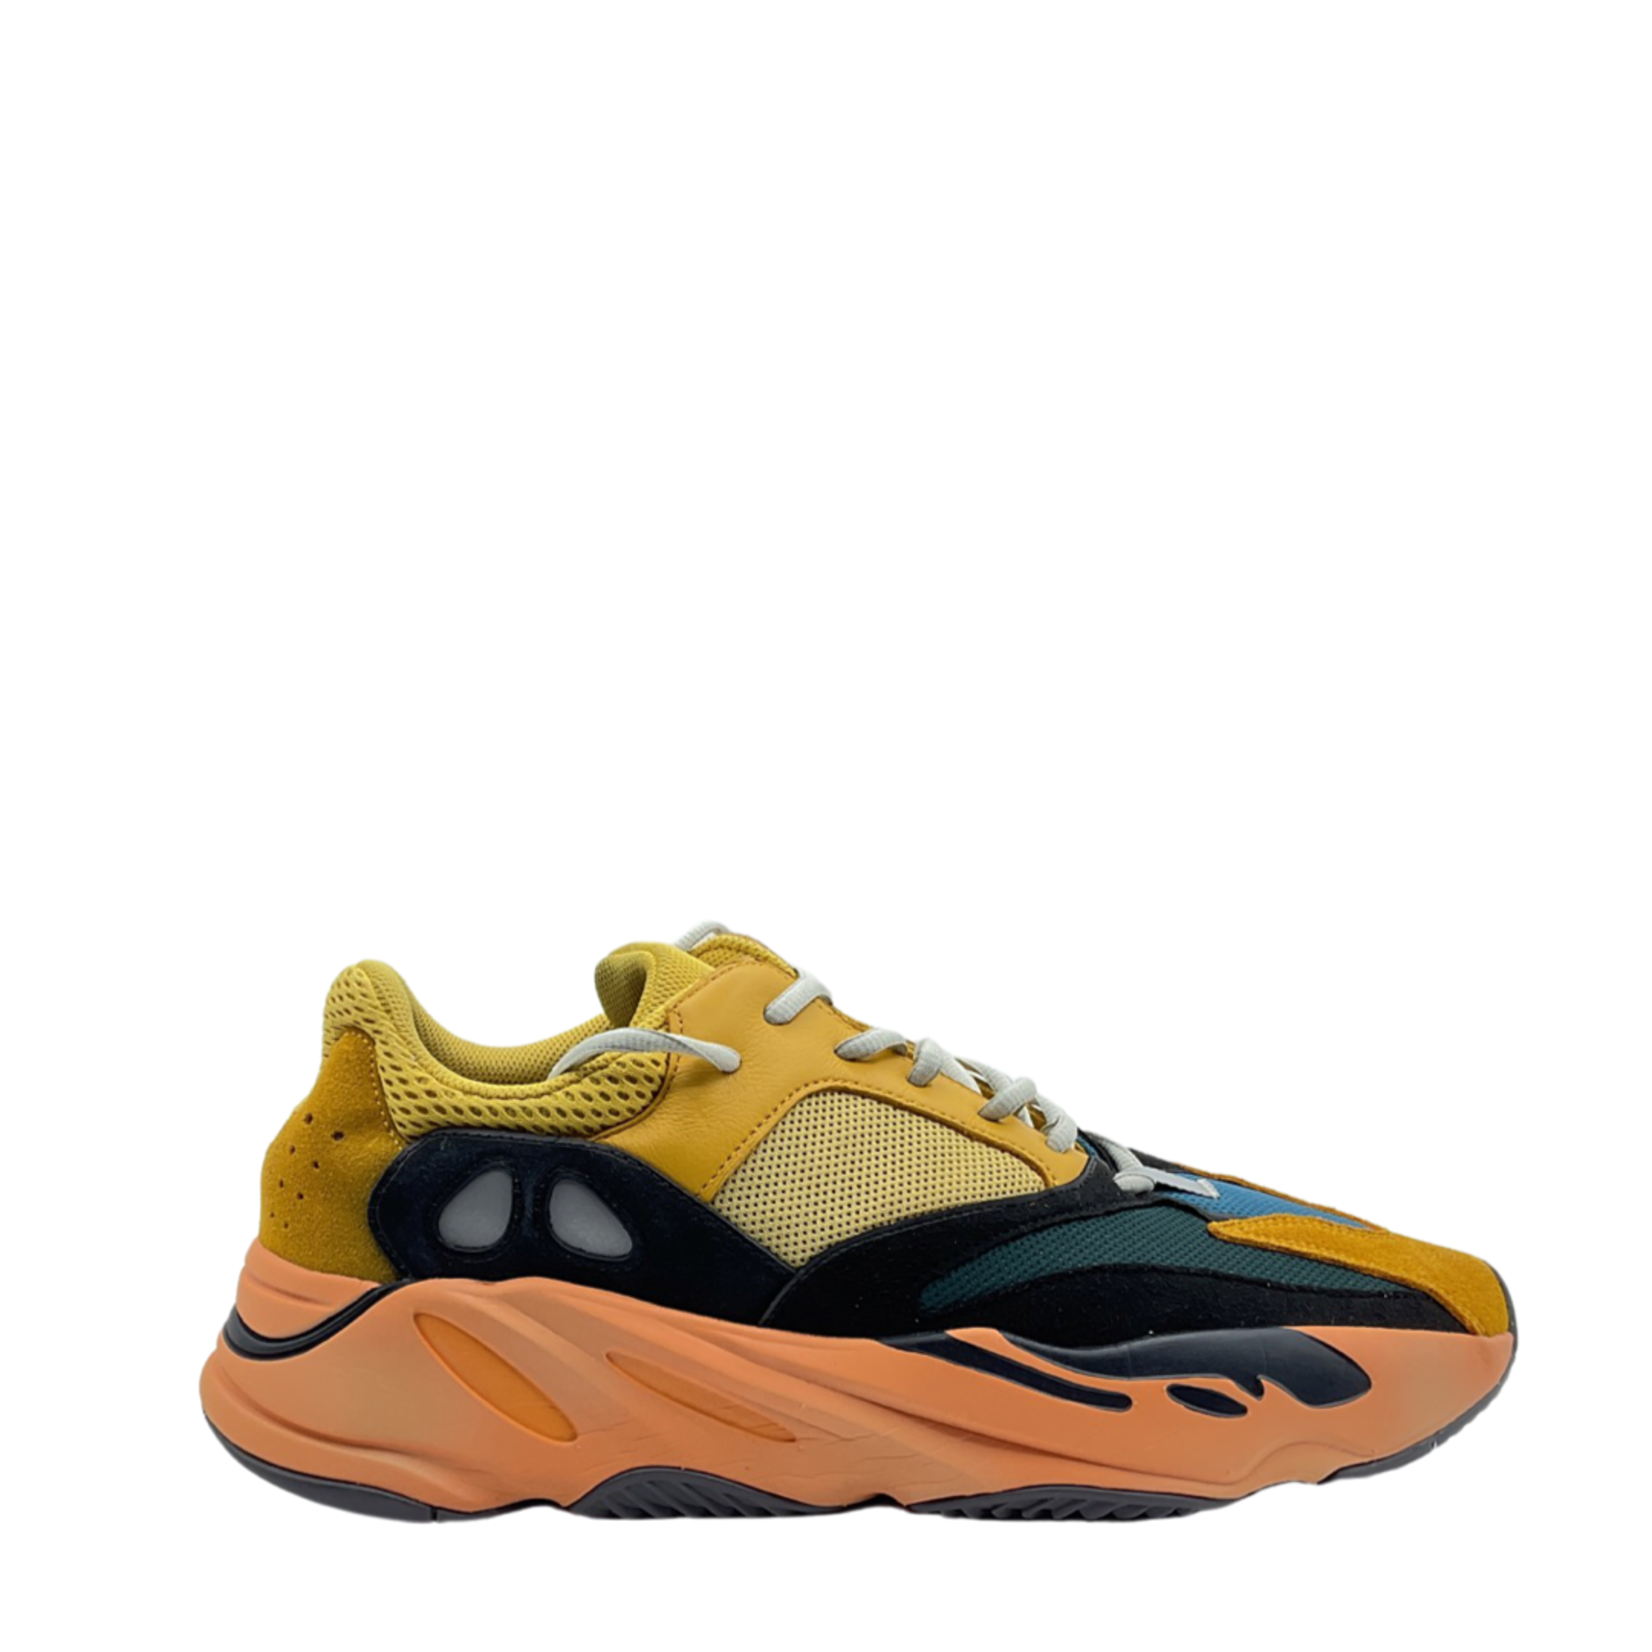 Adidas adidas Yeezy Boost 700 Sun (C)